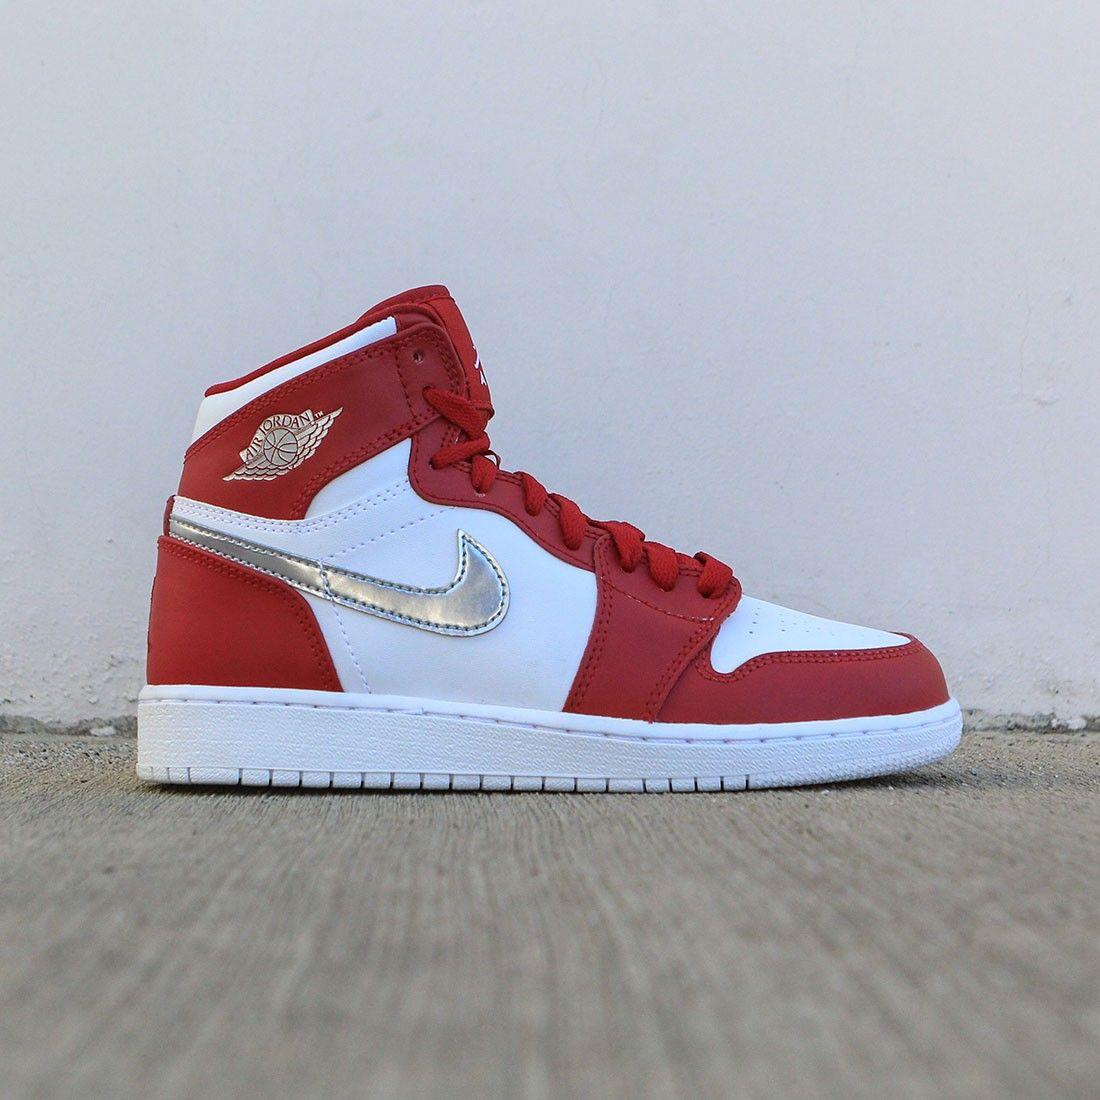 promo code 92bd7 538f7 Jordan Big Kids Air Jordan 1 Retro High (GS) (gym red   metallic  silver-white)